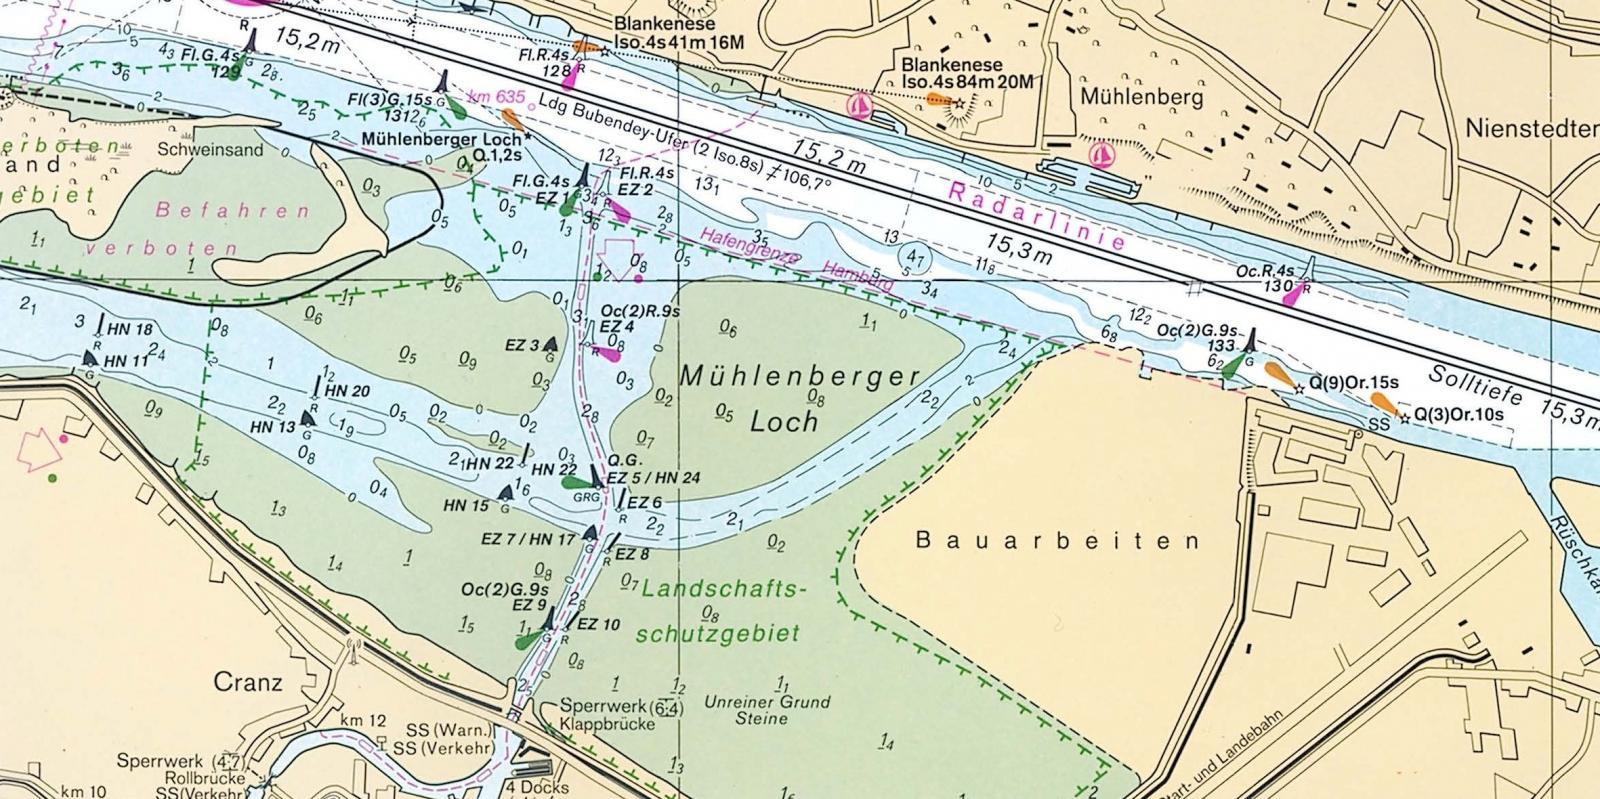 Karte Muehlo-web2